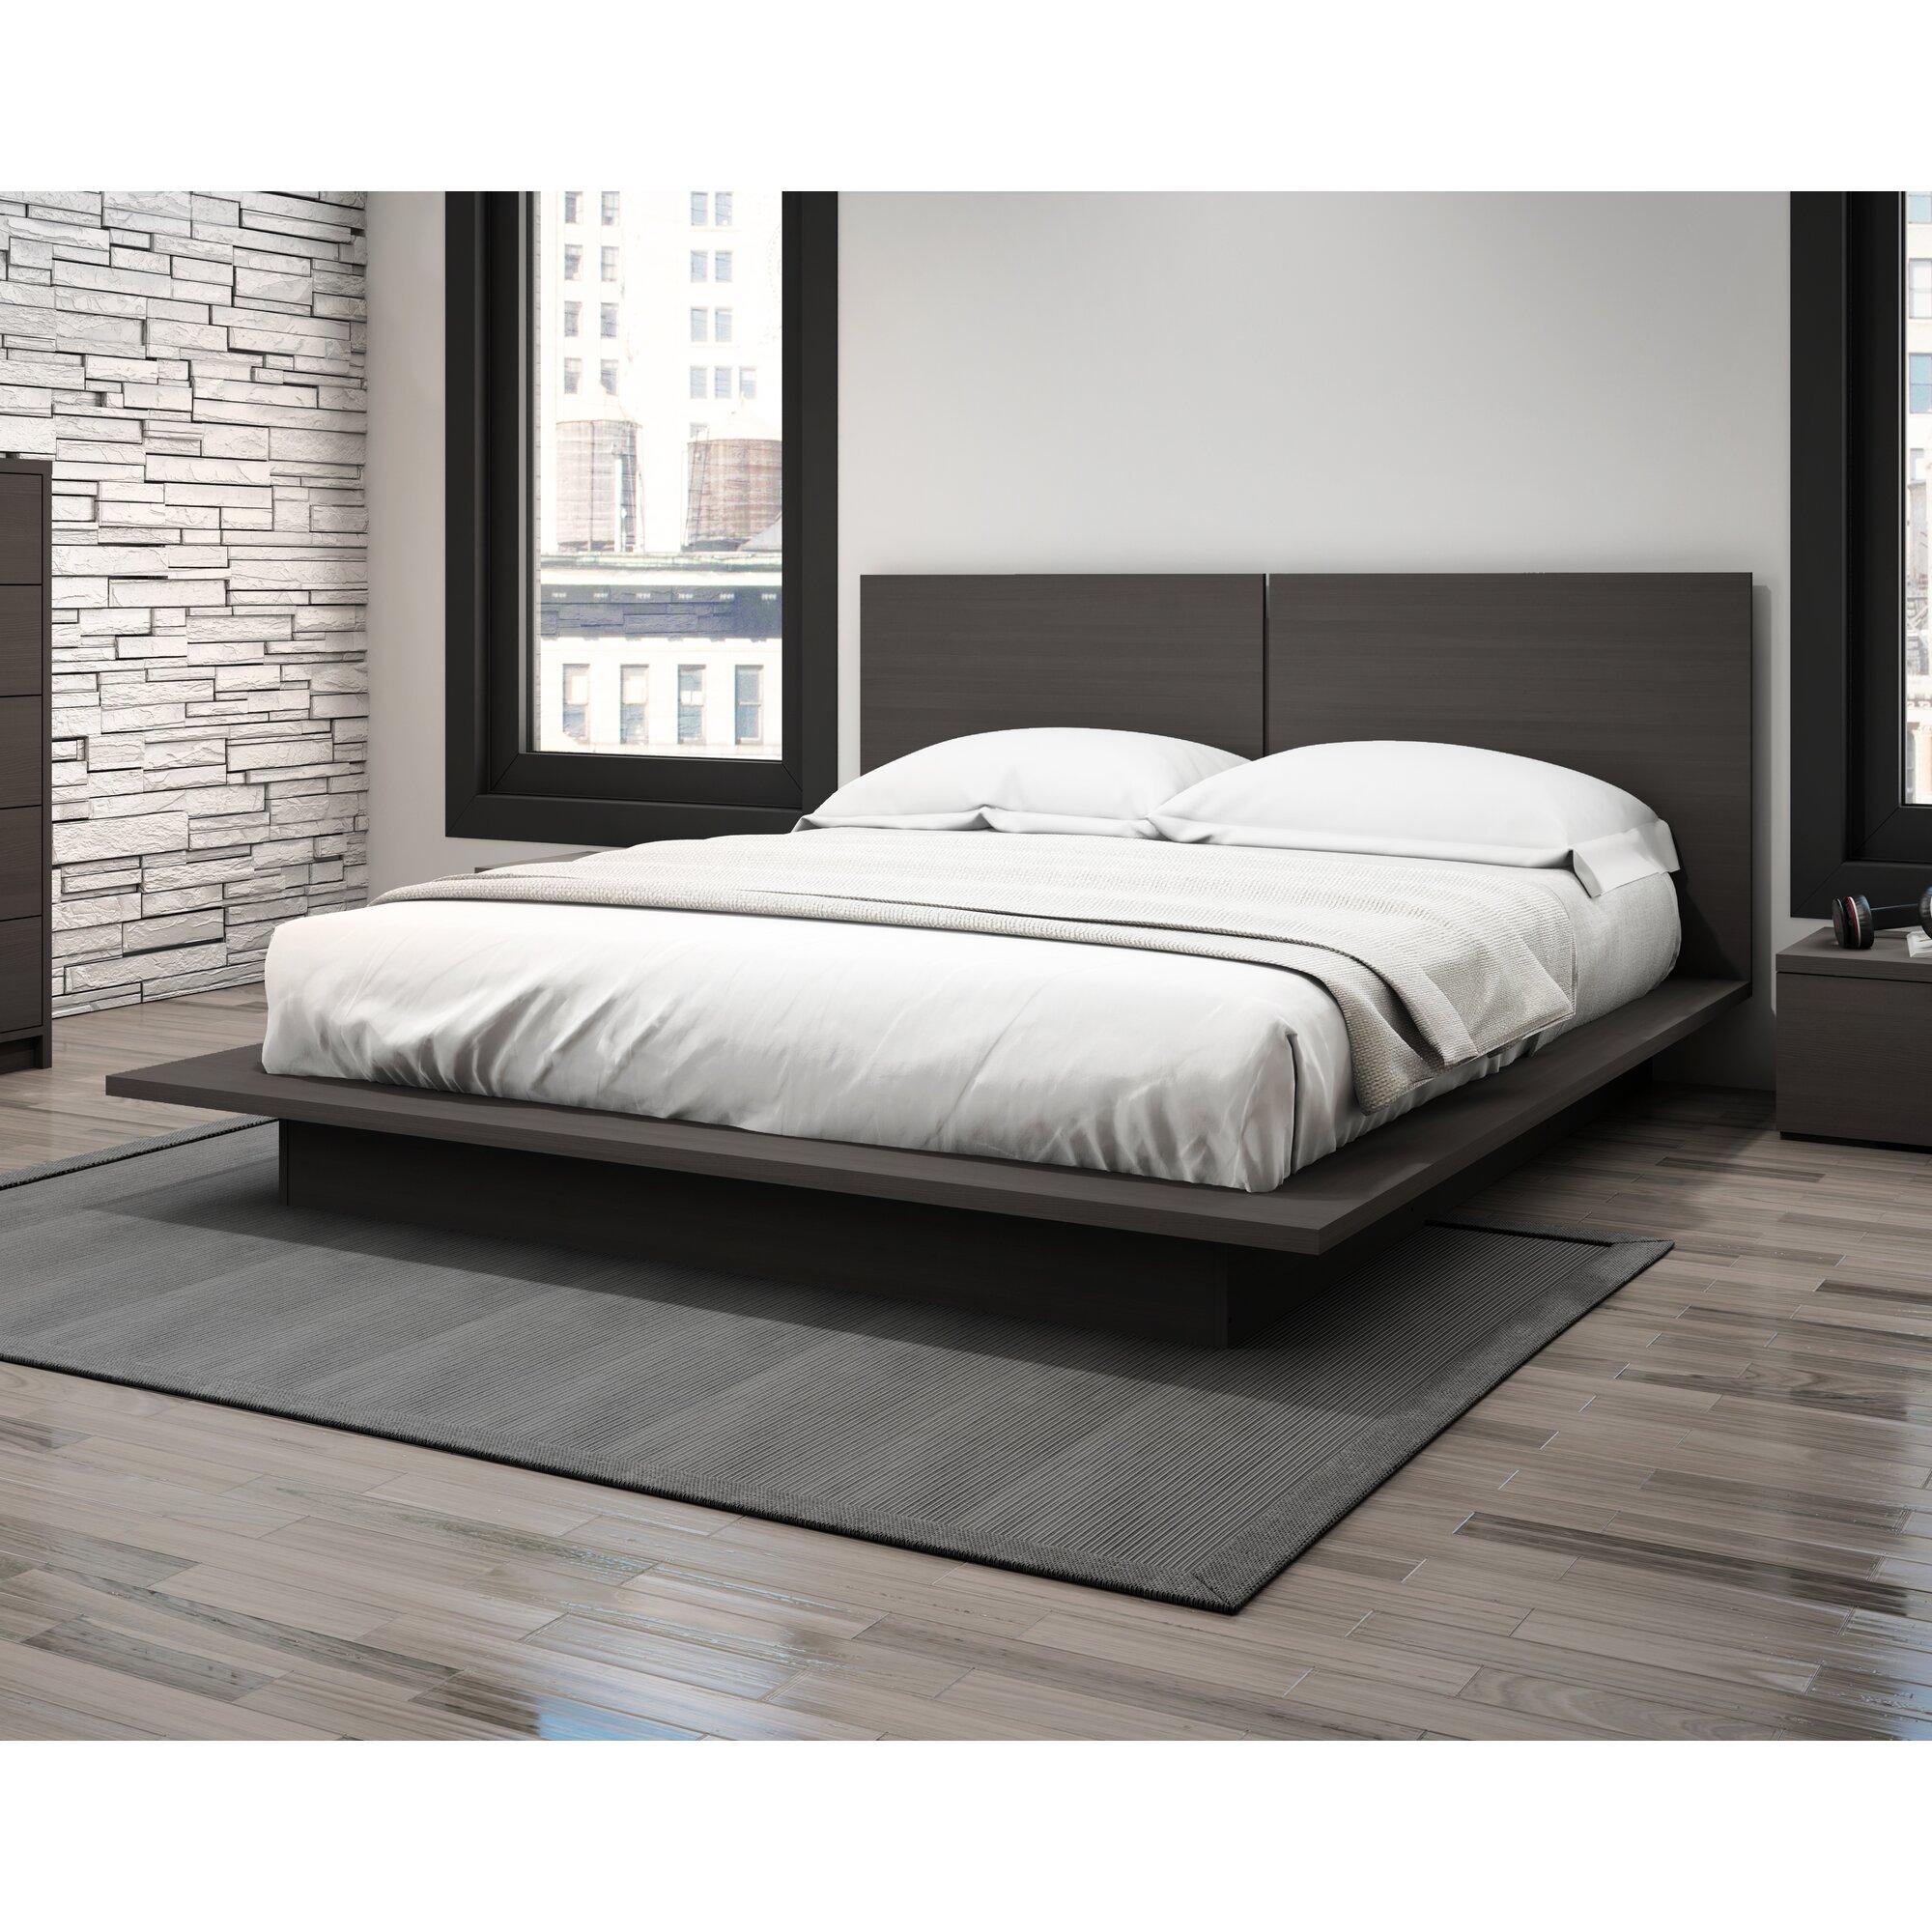 allendale queen platform bed  reviews  allmodern - allendale queen platform bed